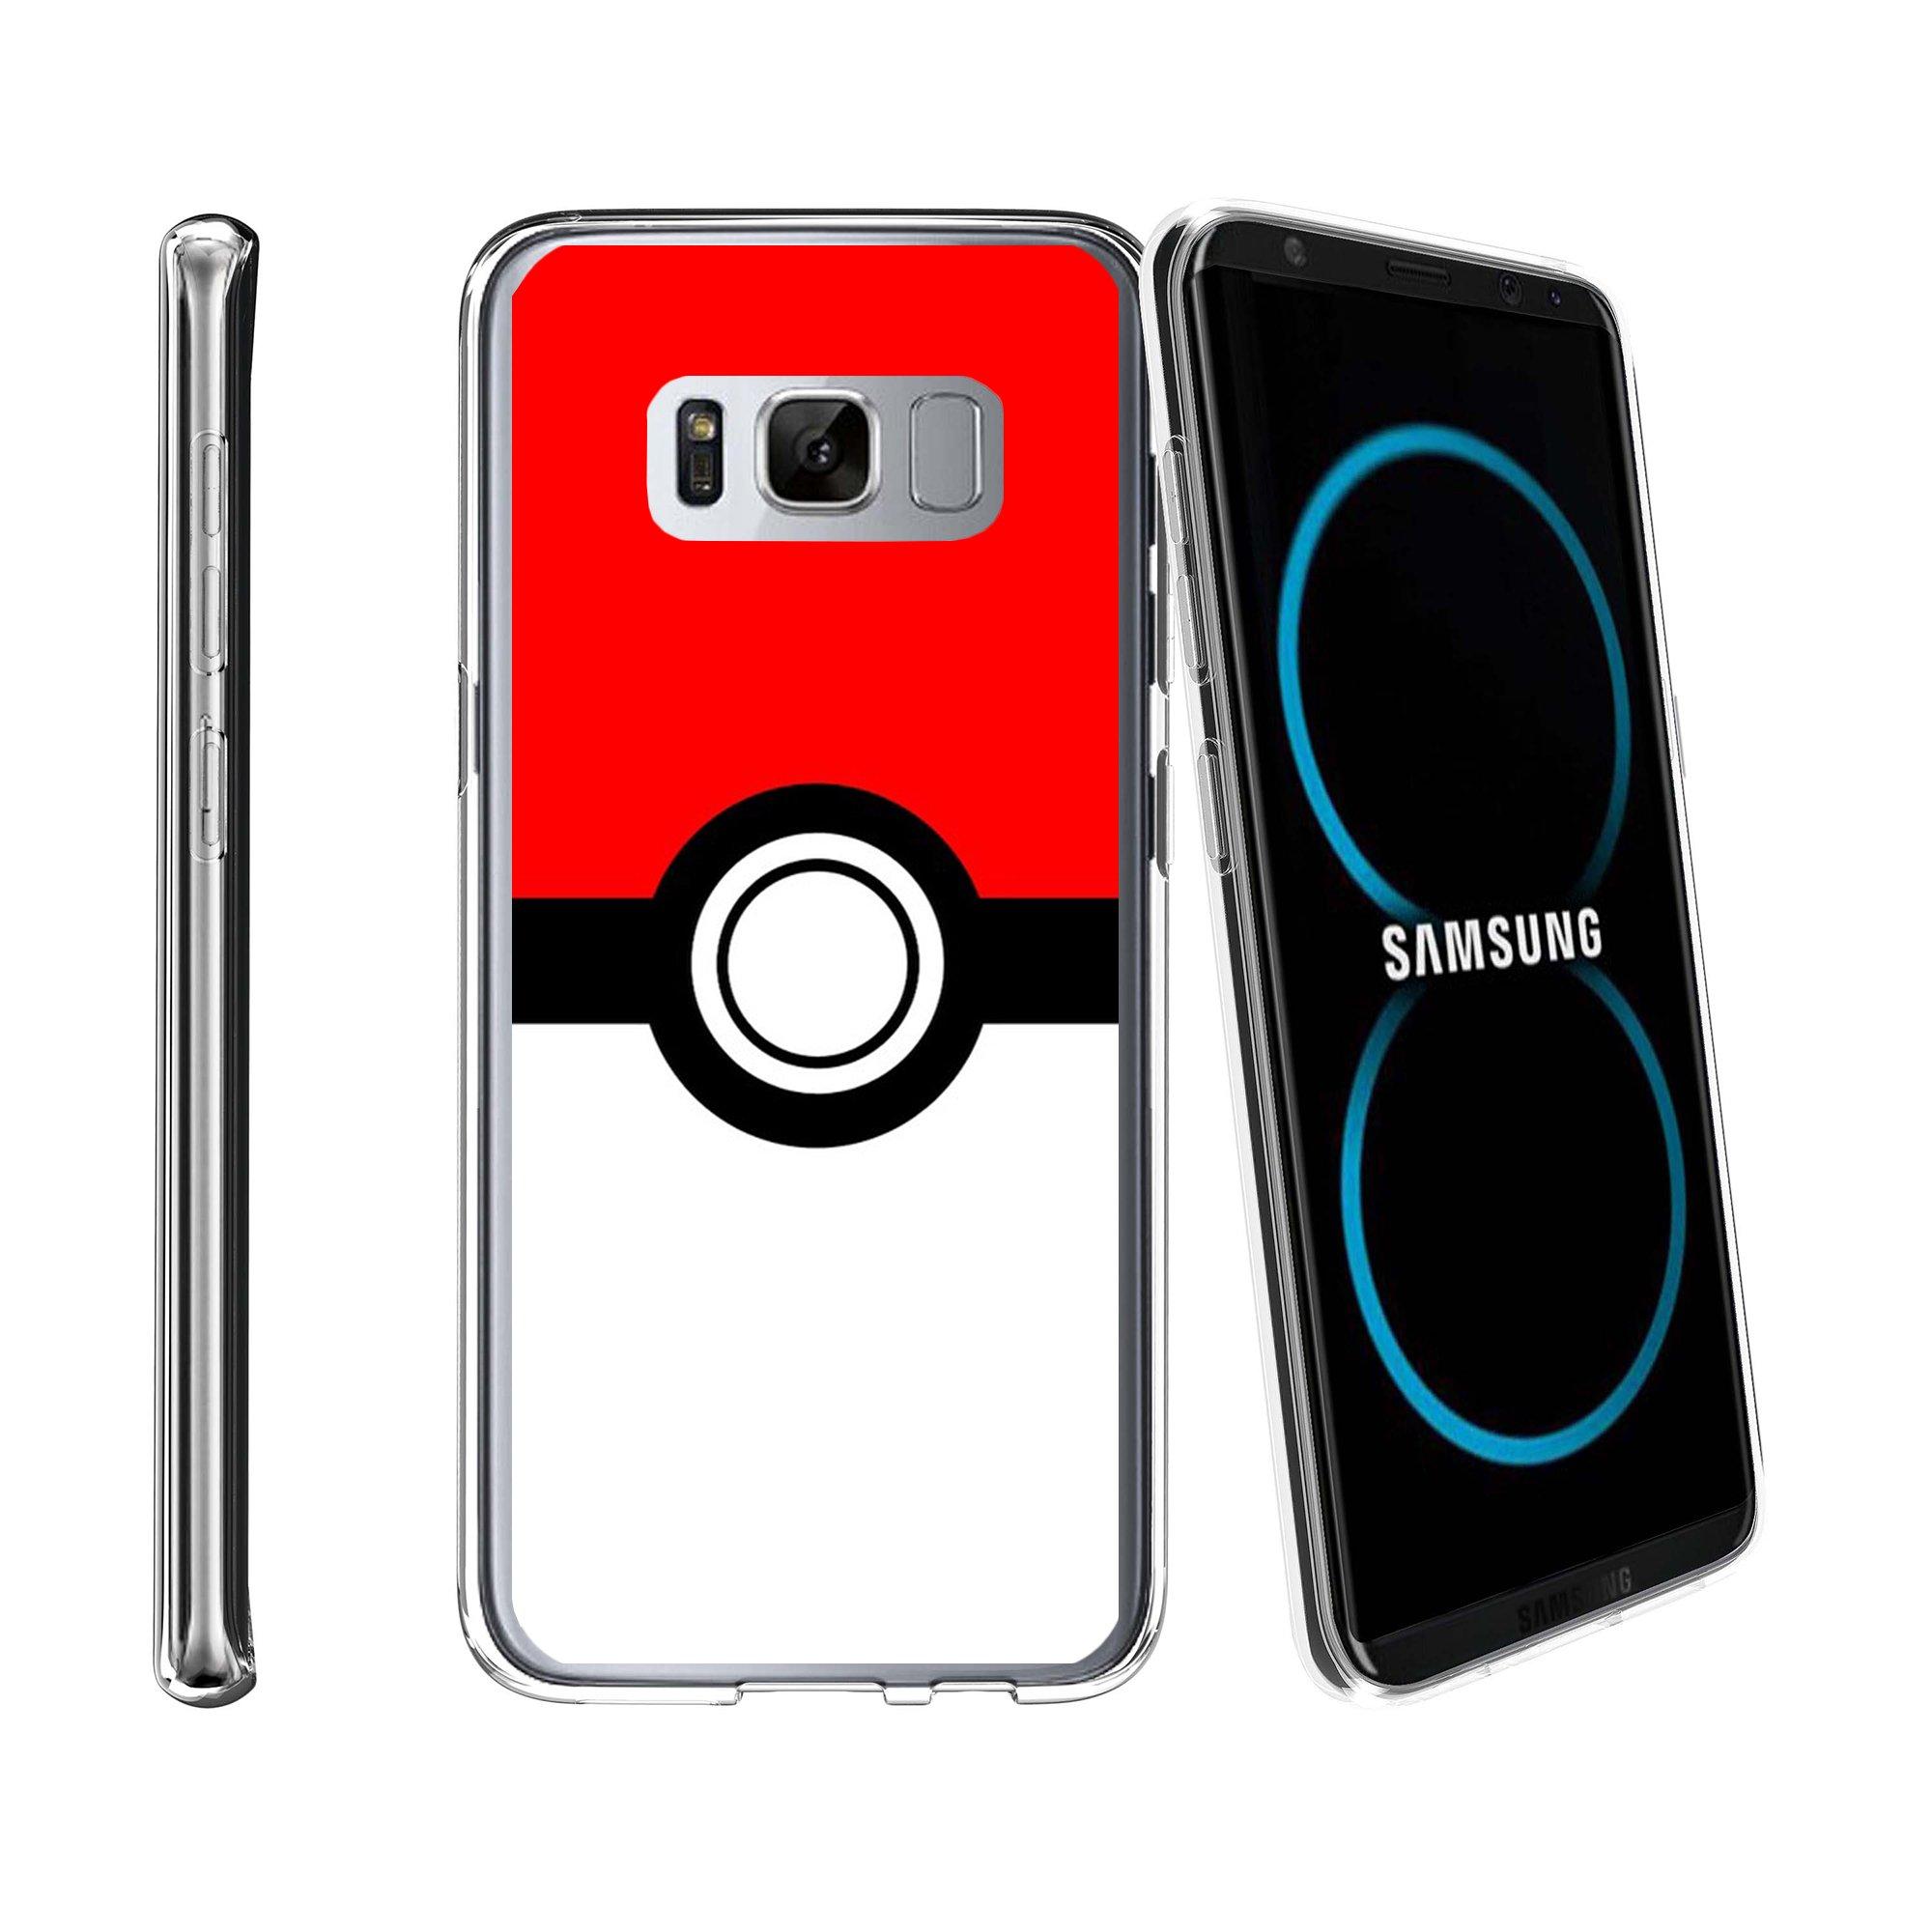 Case for Samsung Galaxy S8 Plus | Galaxy S8 Plus Transparent Silicone Case [ Flex Force ] Flexible Clear Case Unique Collection